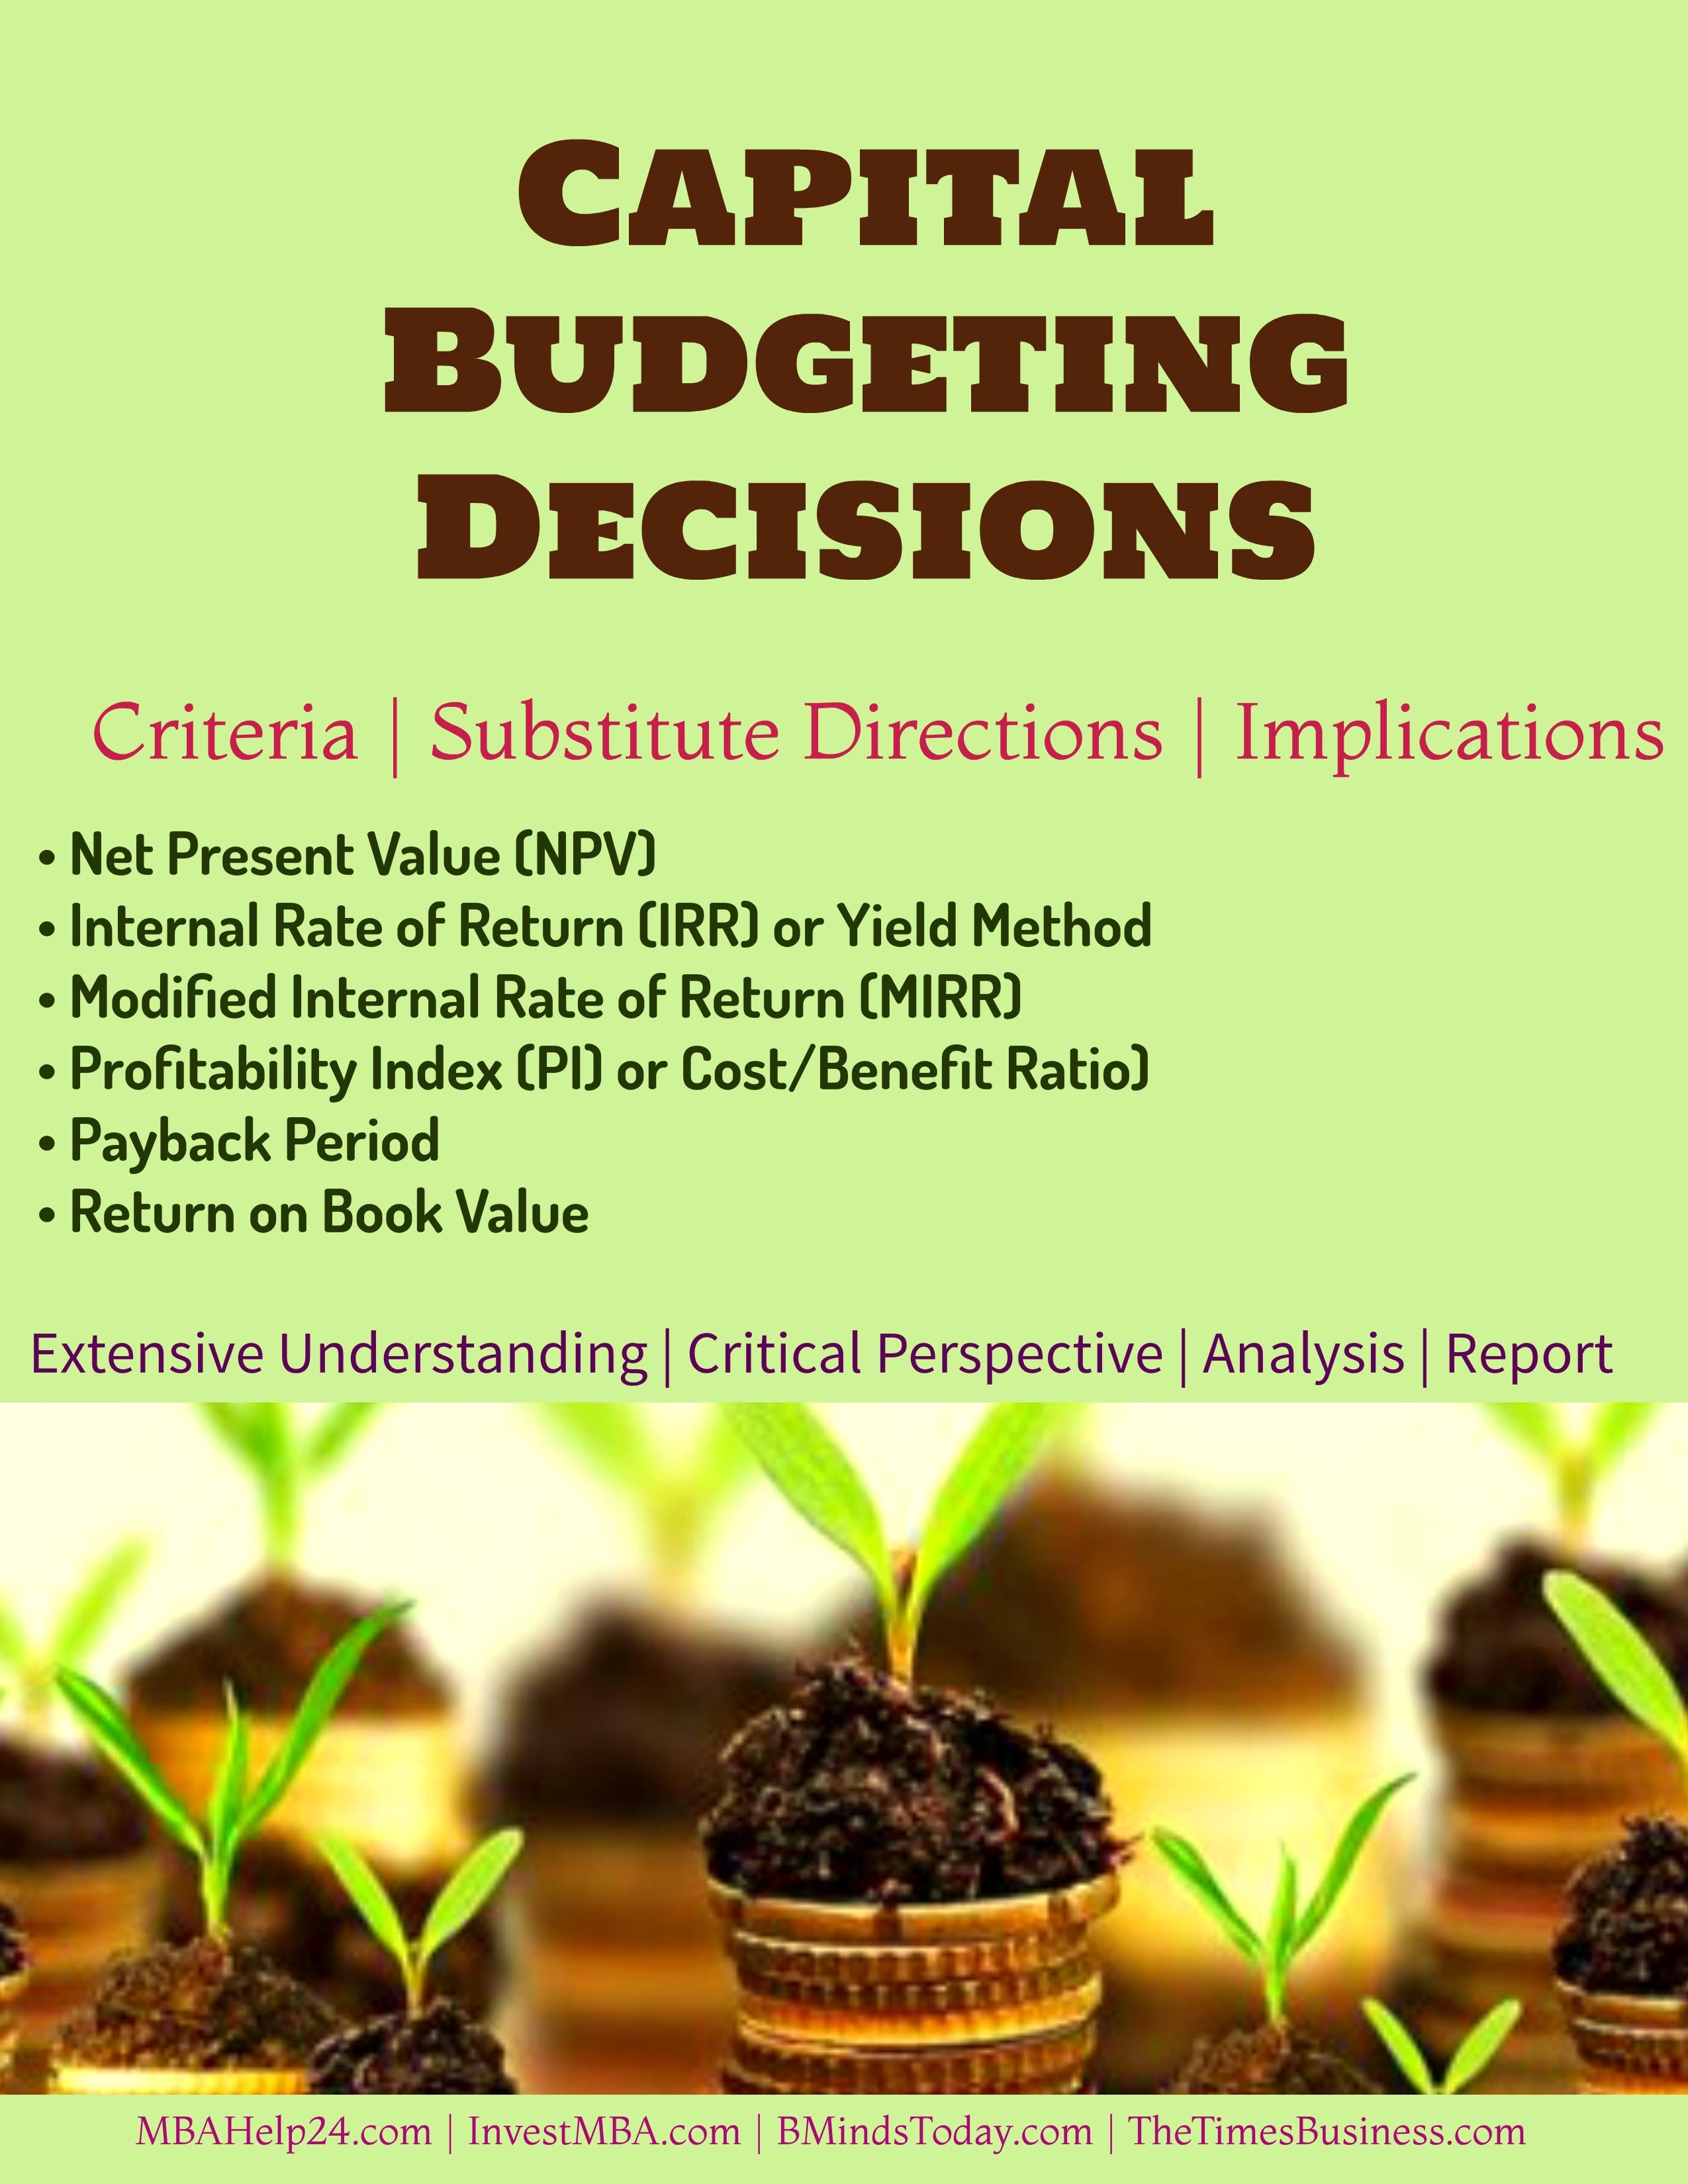 Capital Budgeting Decisions | Criteria | Substitute Directions | Implications capital budgeting Capital Budgeting Decisions | Criteria | Substitute Directions | Implications Capital Budgeting Decisions Criteria Substitute Directions Implications